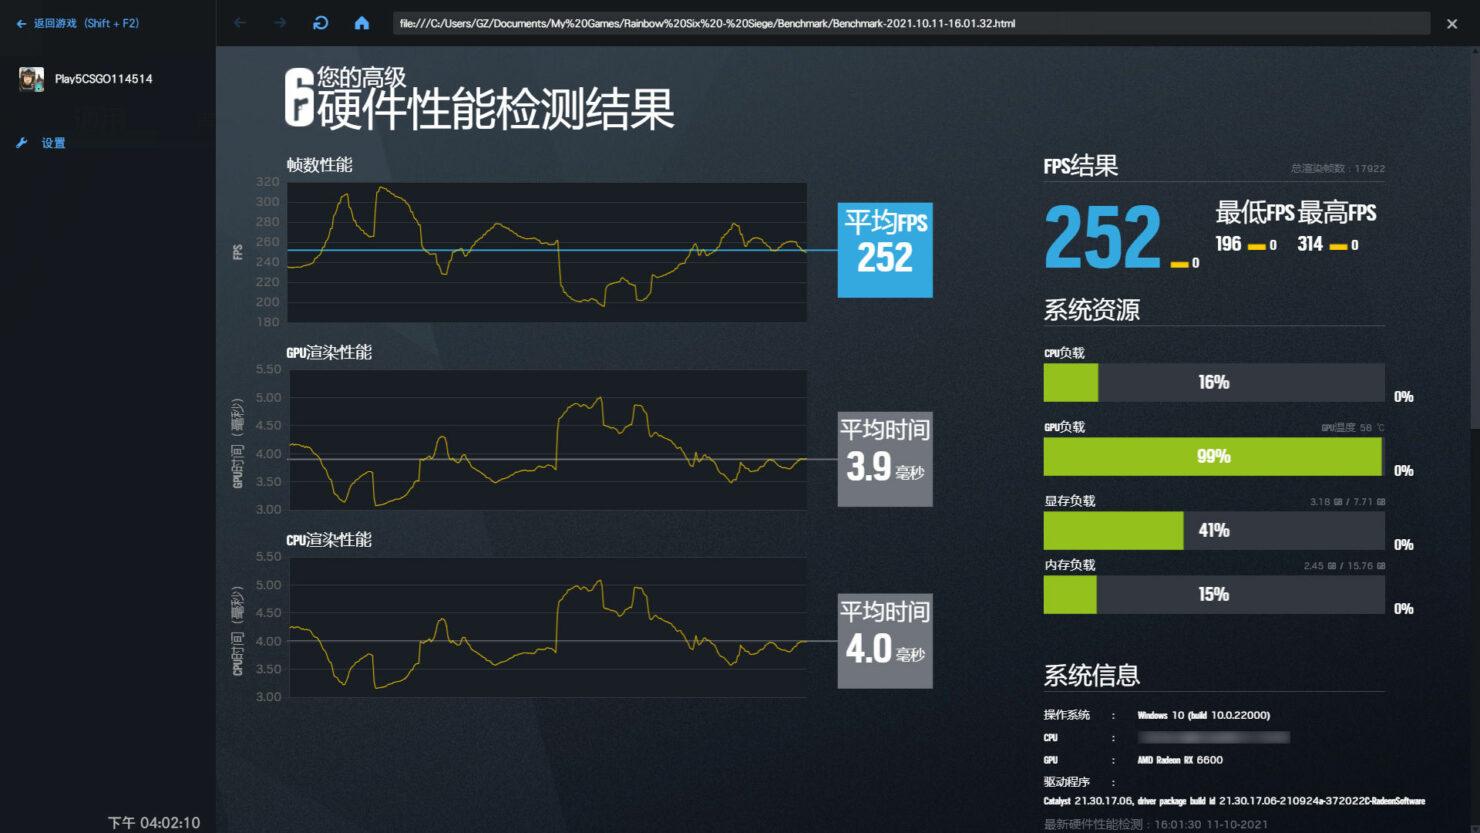 intel-core-i9-12900k-alder-lake-cpu-benchmarks-_-rainbow-six-siege